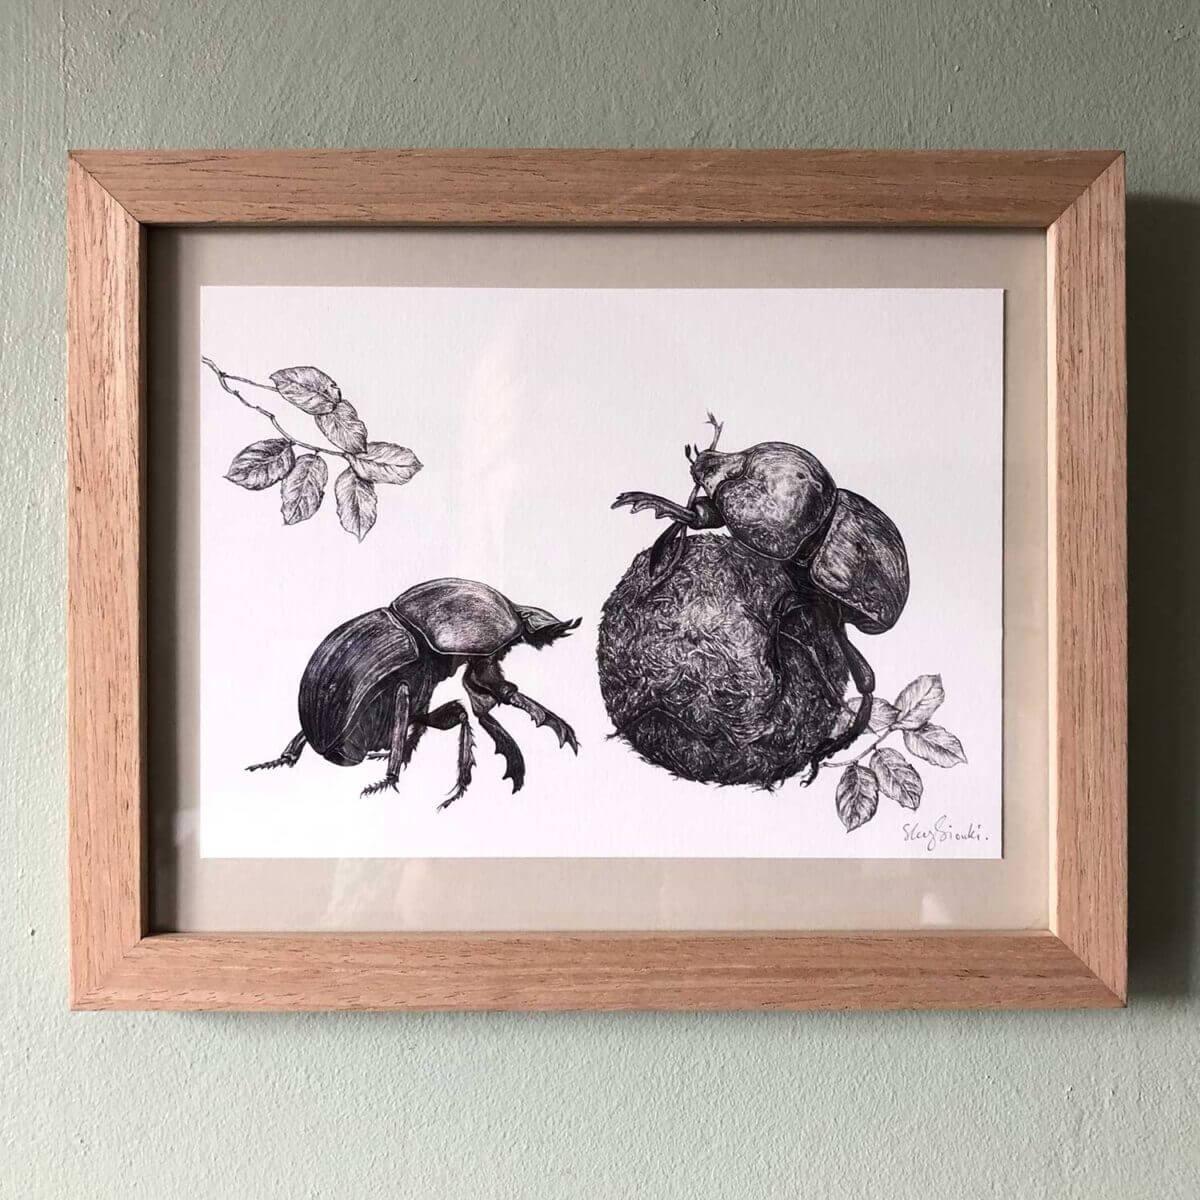 Dung-Beetle-Print-Frame-Sky-Siouki